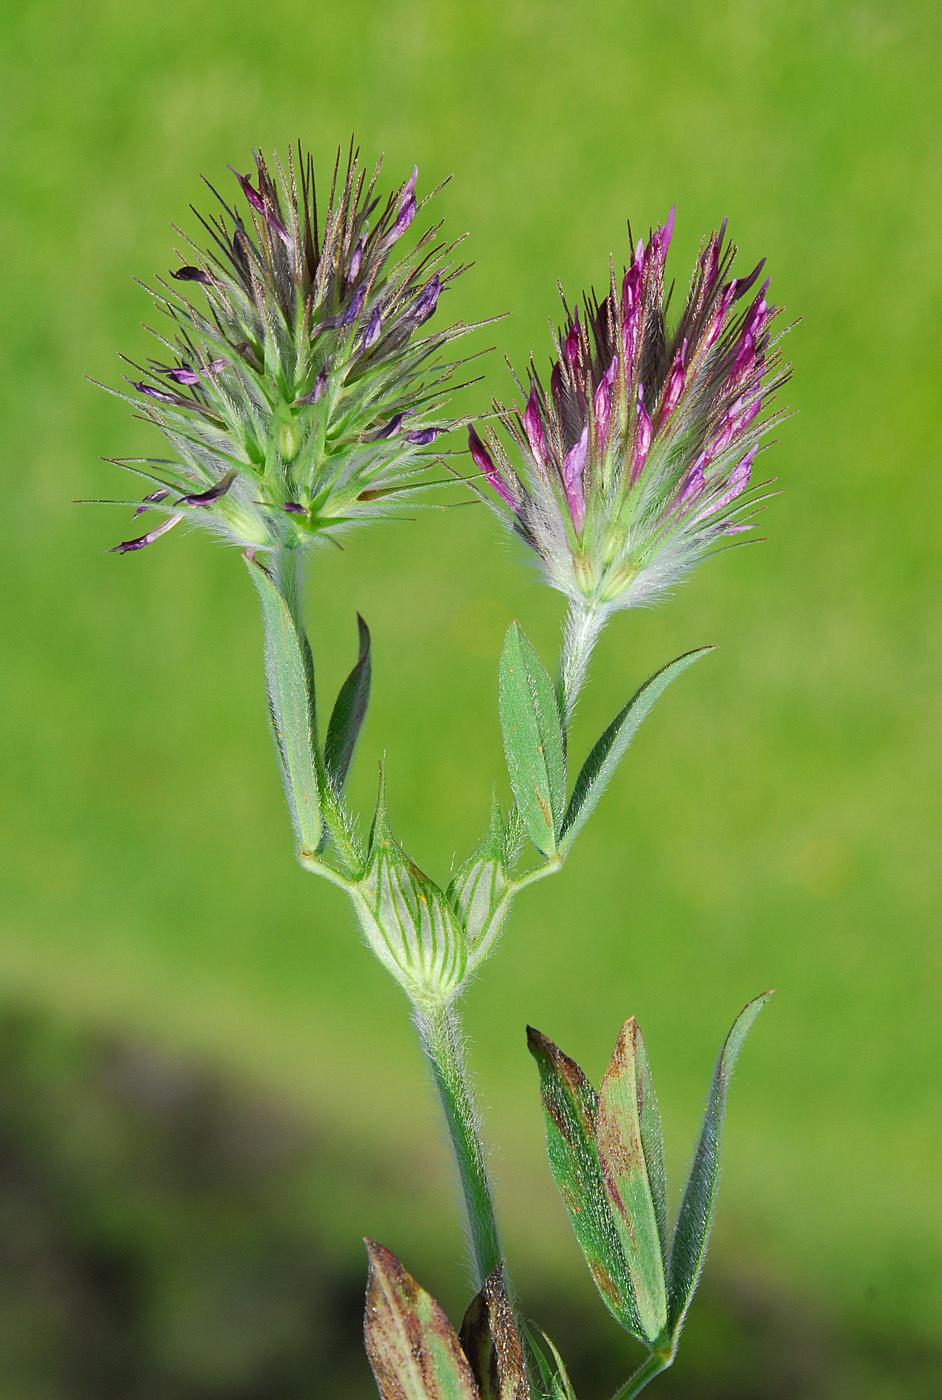 https://pictures.bgbm.org/digilib/Scaler?fn=Cyprus/Trifolium_dasyurum_B1.jpg&mo=file